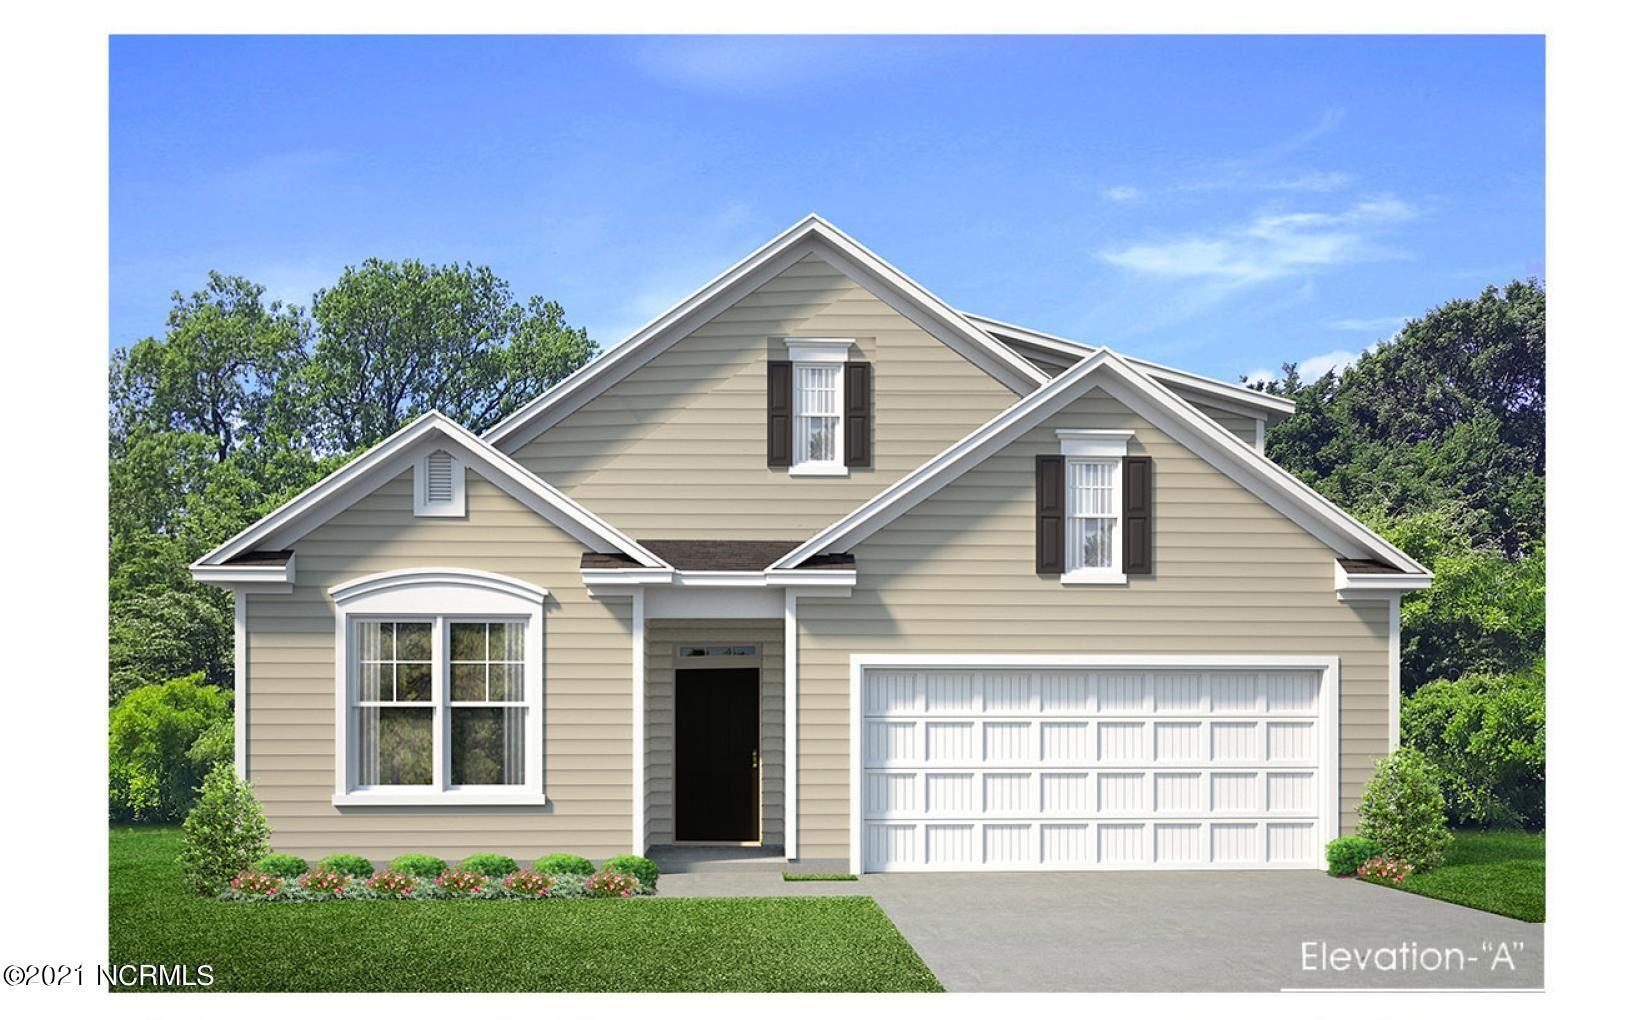 Photo for 205 Saint Earl Lane #Lot 18, Wilmington, NC 28411 (MLS # 100262329)